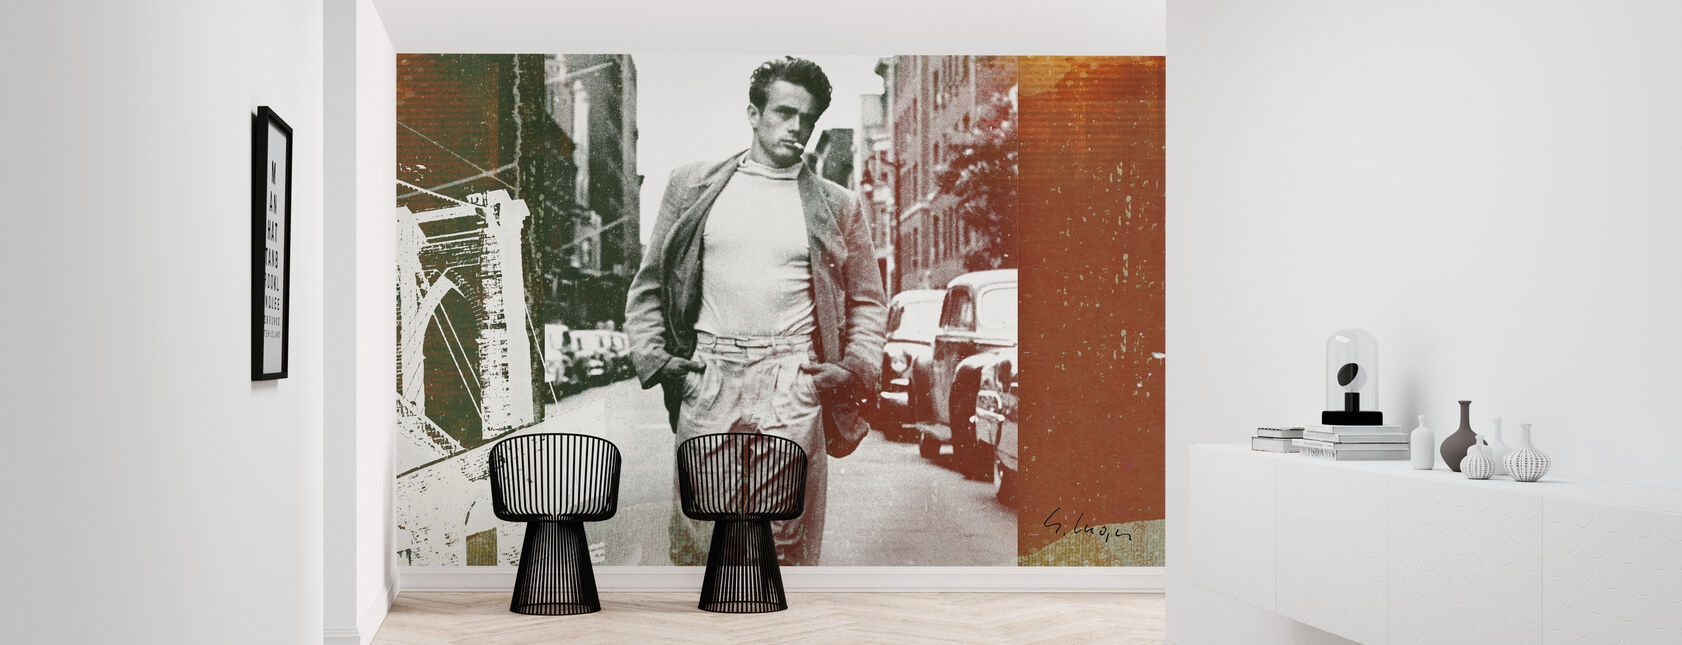 James Dean XVI - Wallpaper - Hallway